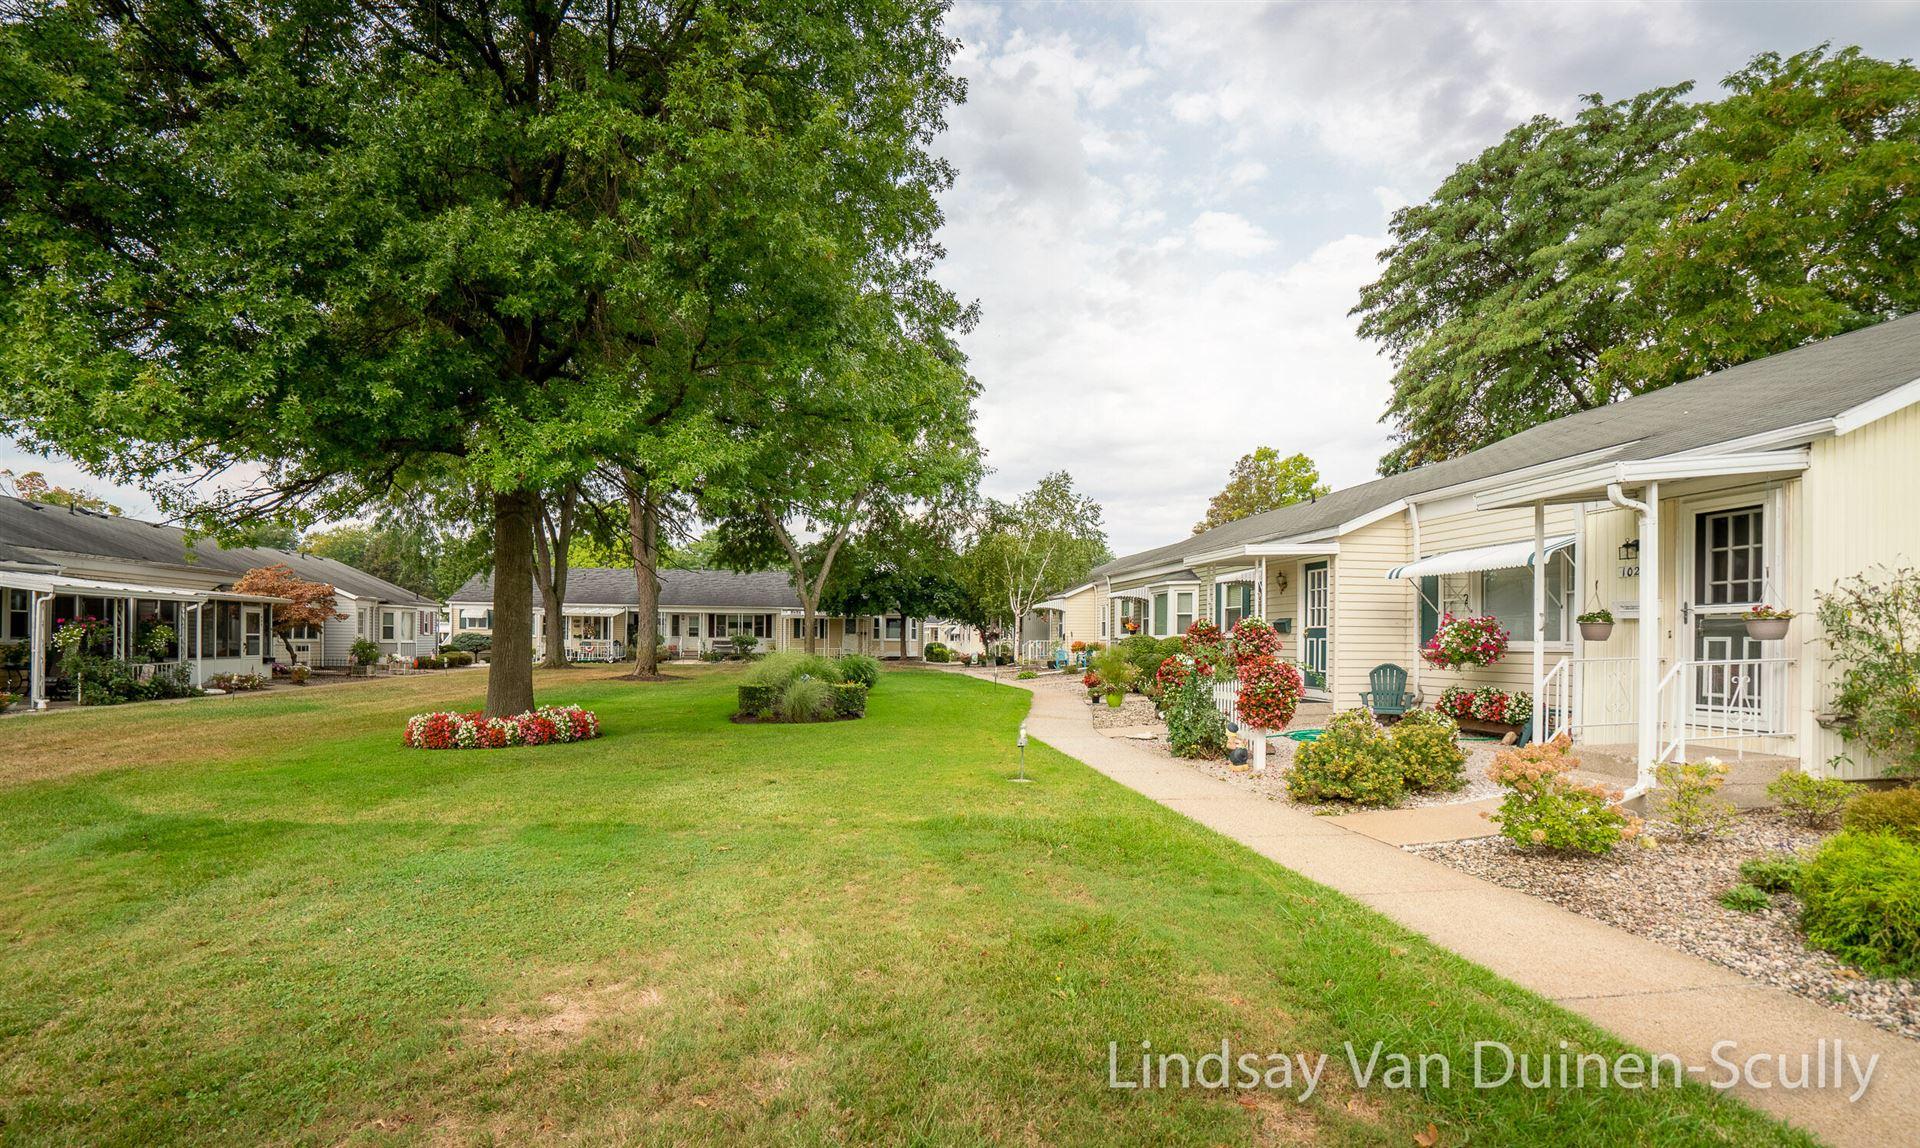 1025 Village Lane, Jenison, MI 49428 - MLS#: 21105783